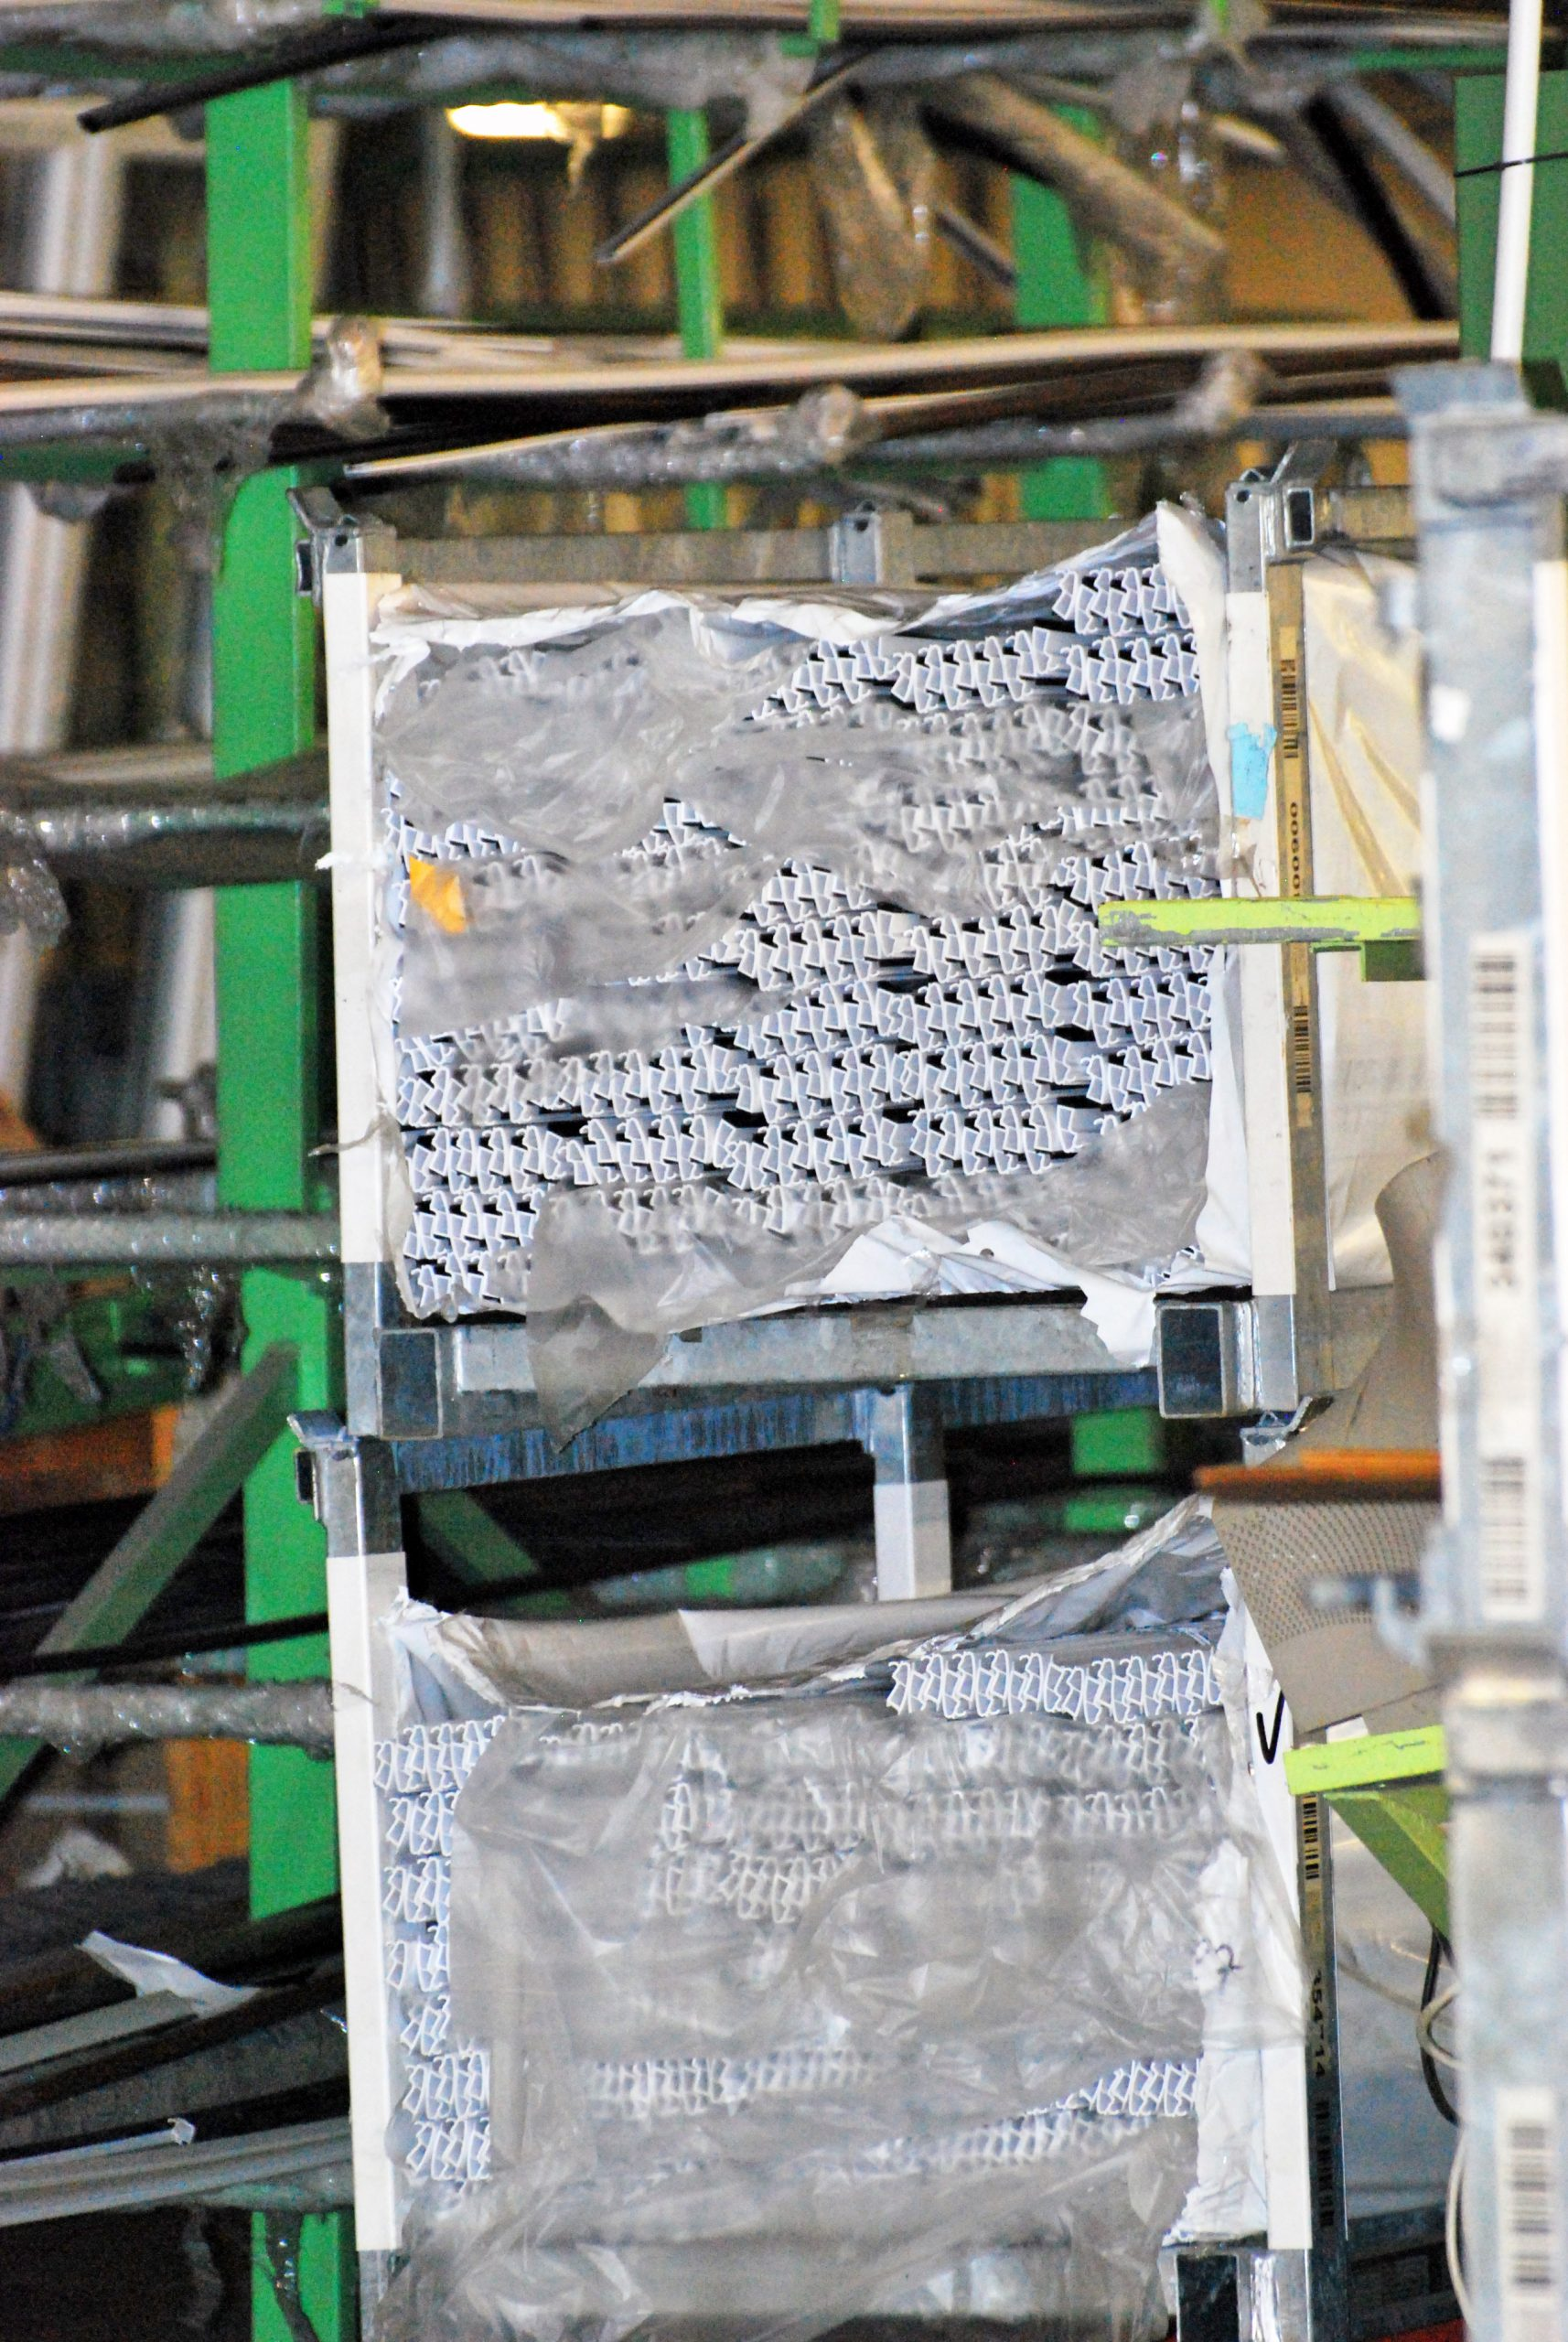 Full Size of Profine Gmbh Kbe Fenstersysteme Berlin Fenster Preisliste Fensterprofil 76 Polen Online Kaufen Fensterprofile Wikipedia Erfahrungen Fachhandel Fotogalerie Fenster Kbe Fenster